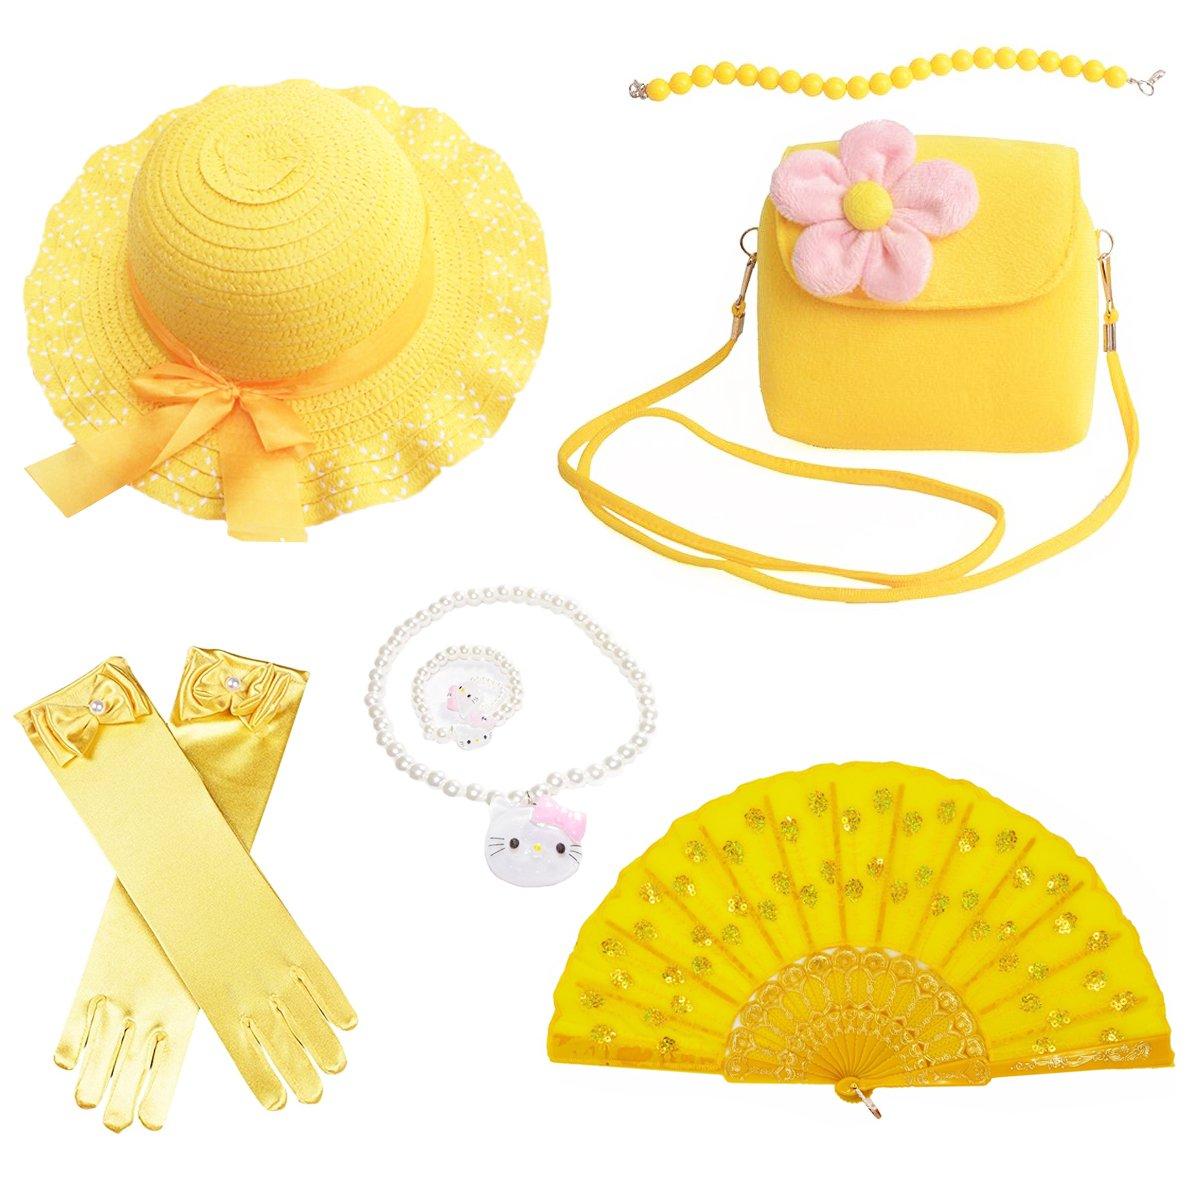 Banadim Girls Party Dress Up Play Set Sun Hat,Handbag, Jewelry -Yellow